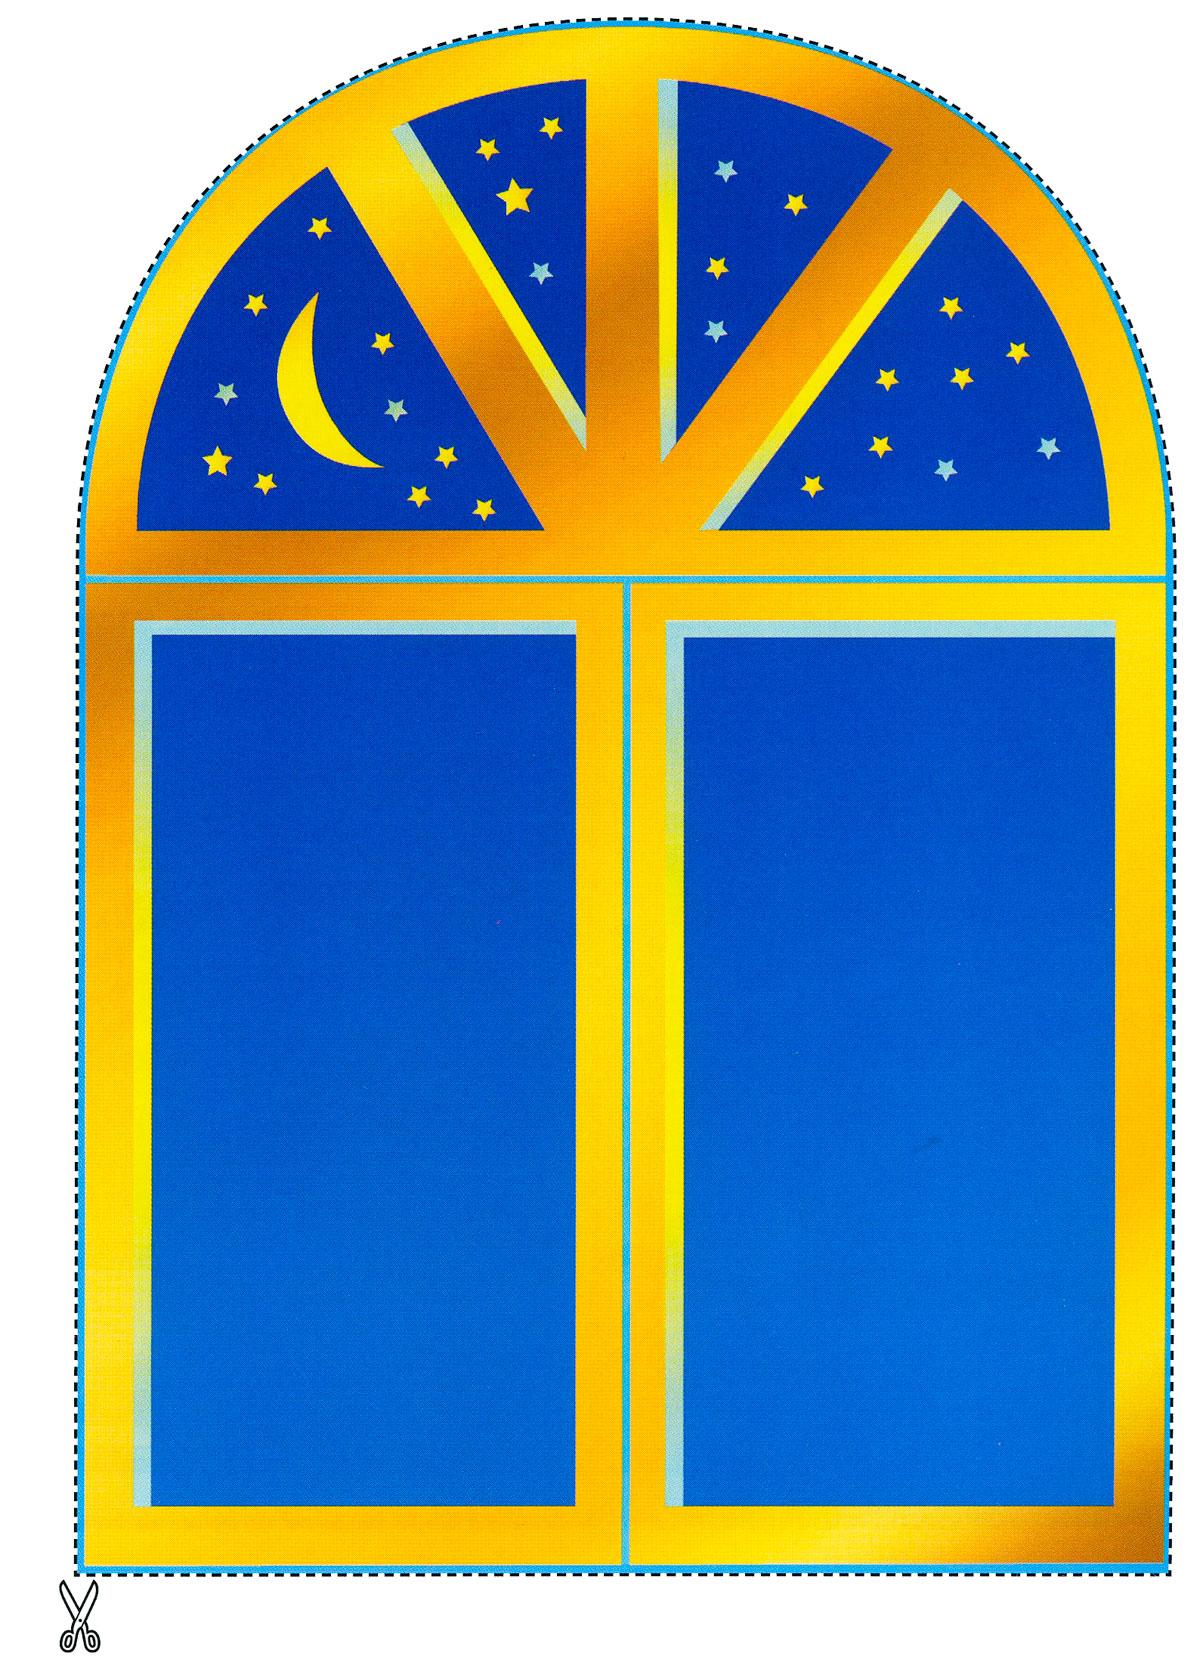 Картинки для детей младшего возраста рисунок шаблон окно